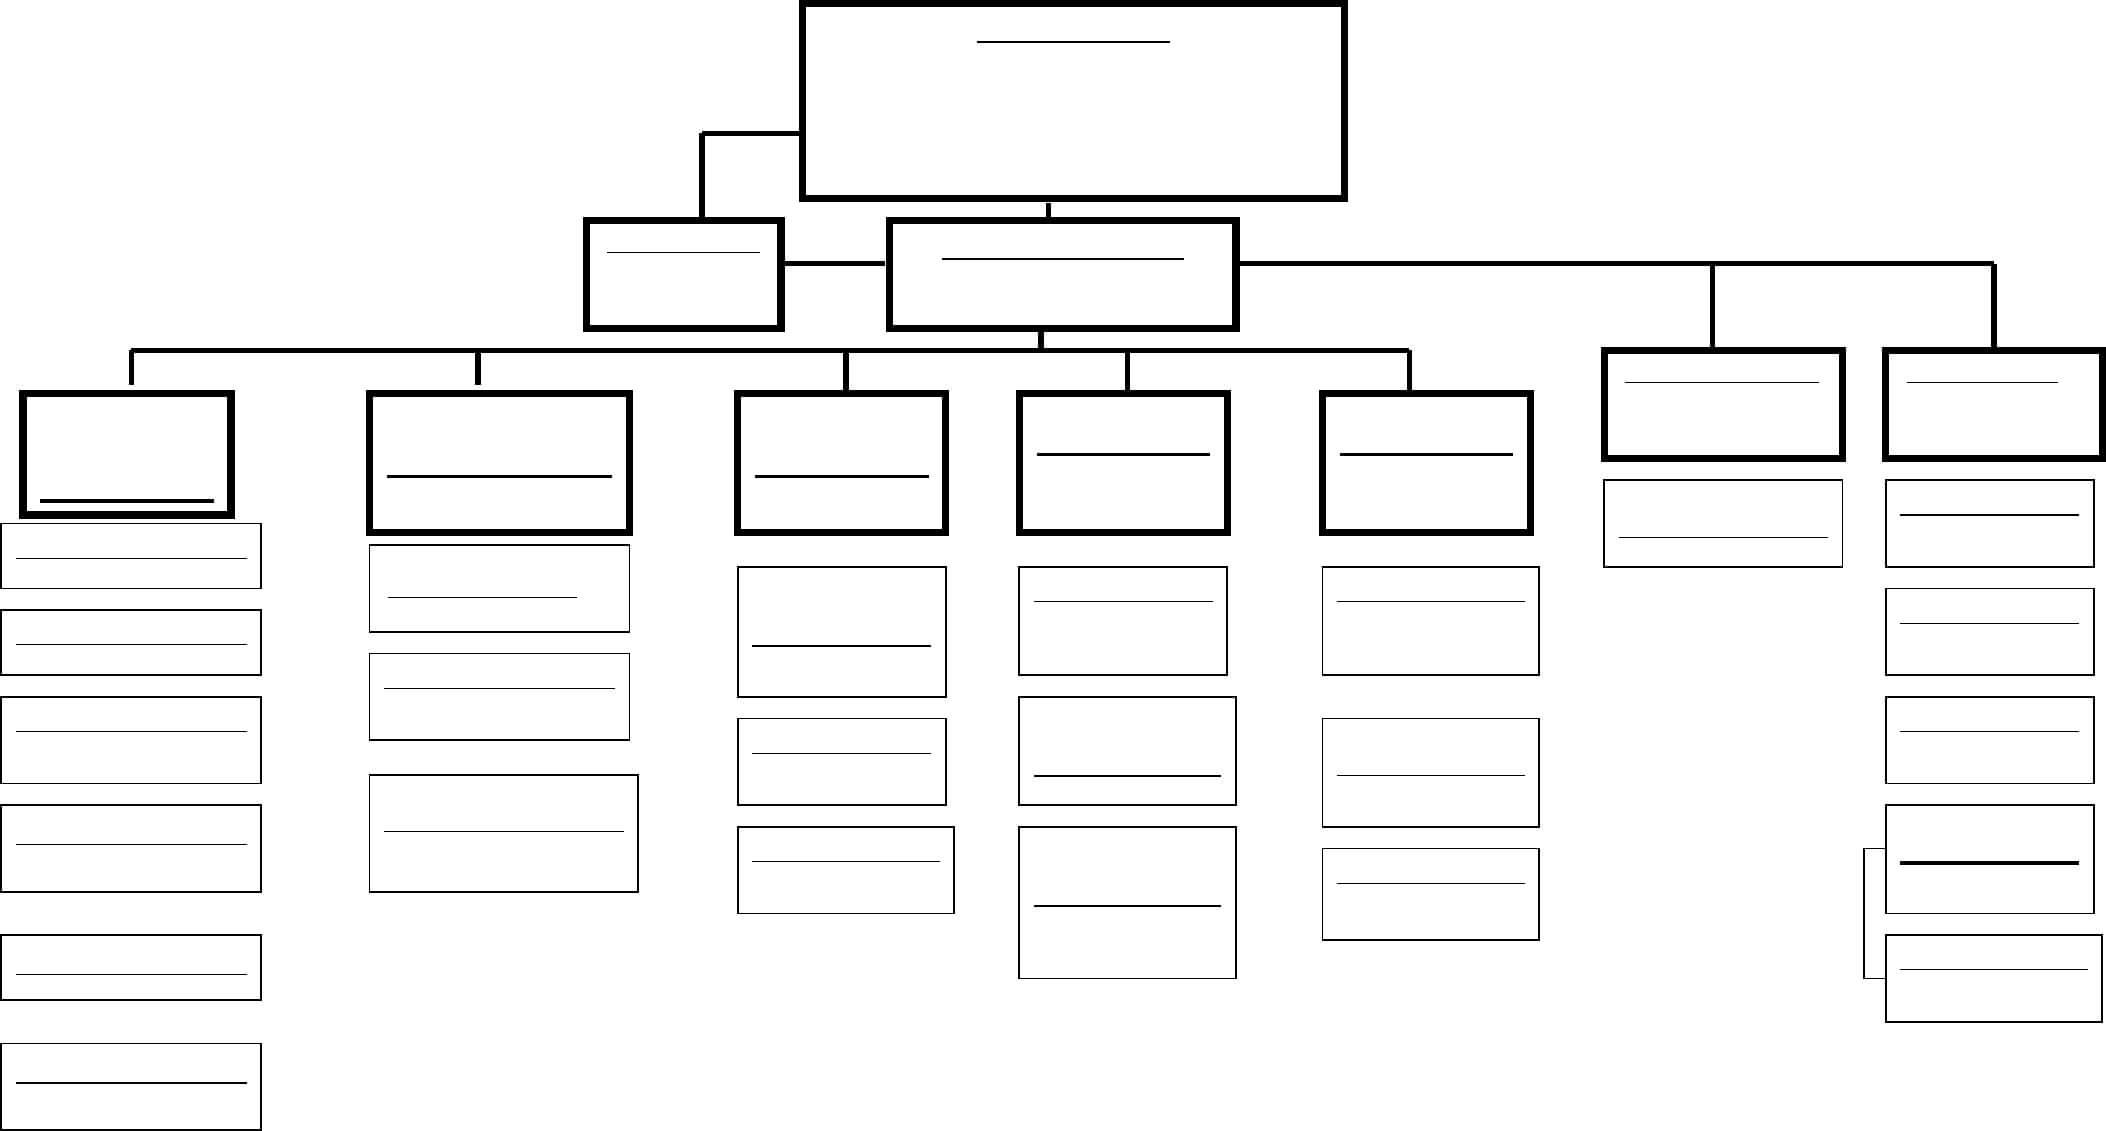 Blank Organizational Chart - Cumberland College Free Download Within Free Blank Organizational Chart Template